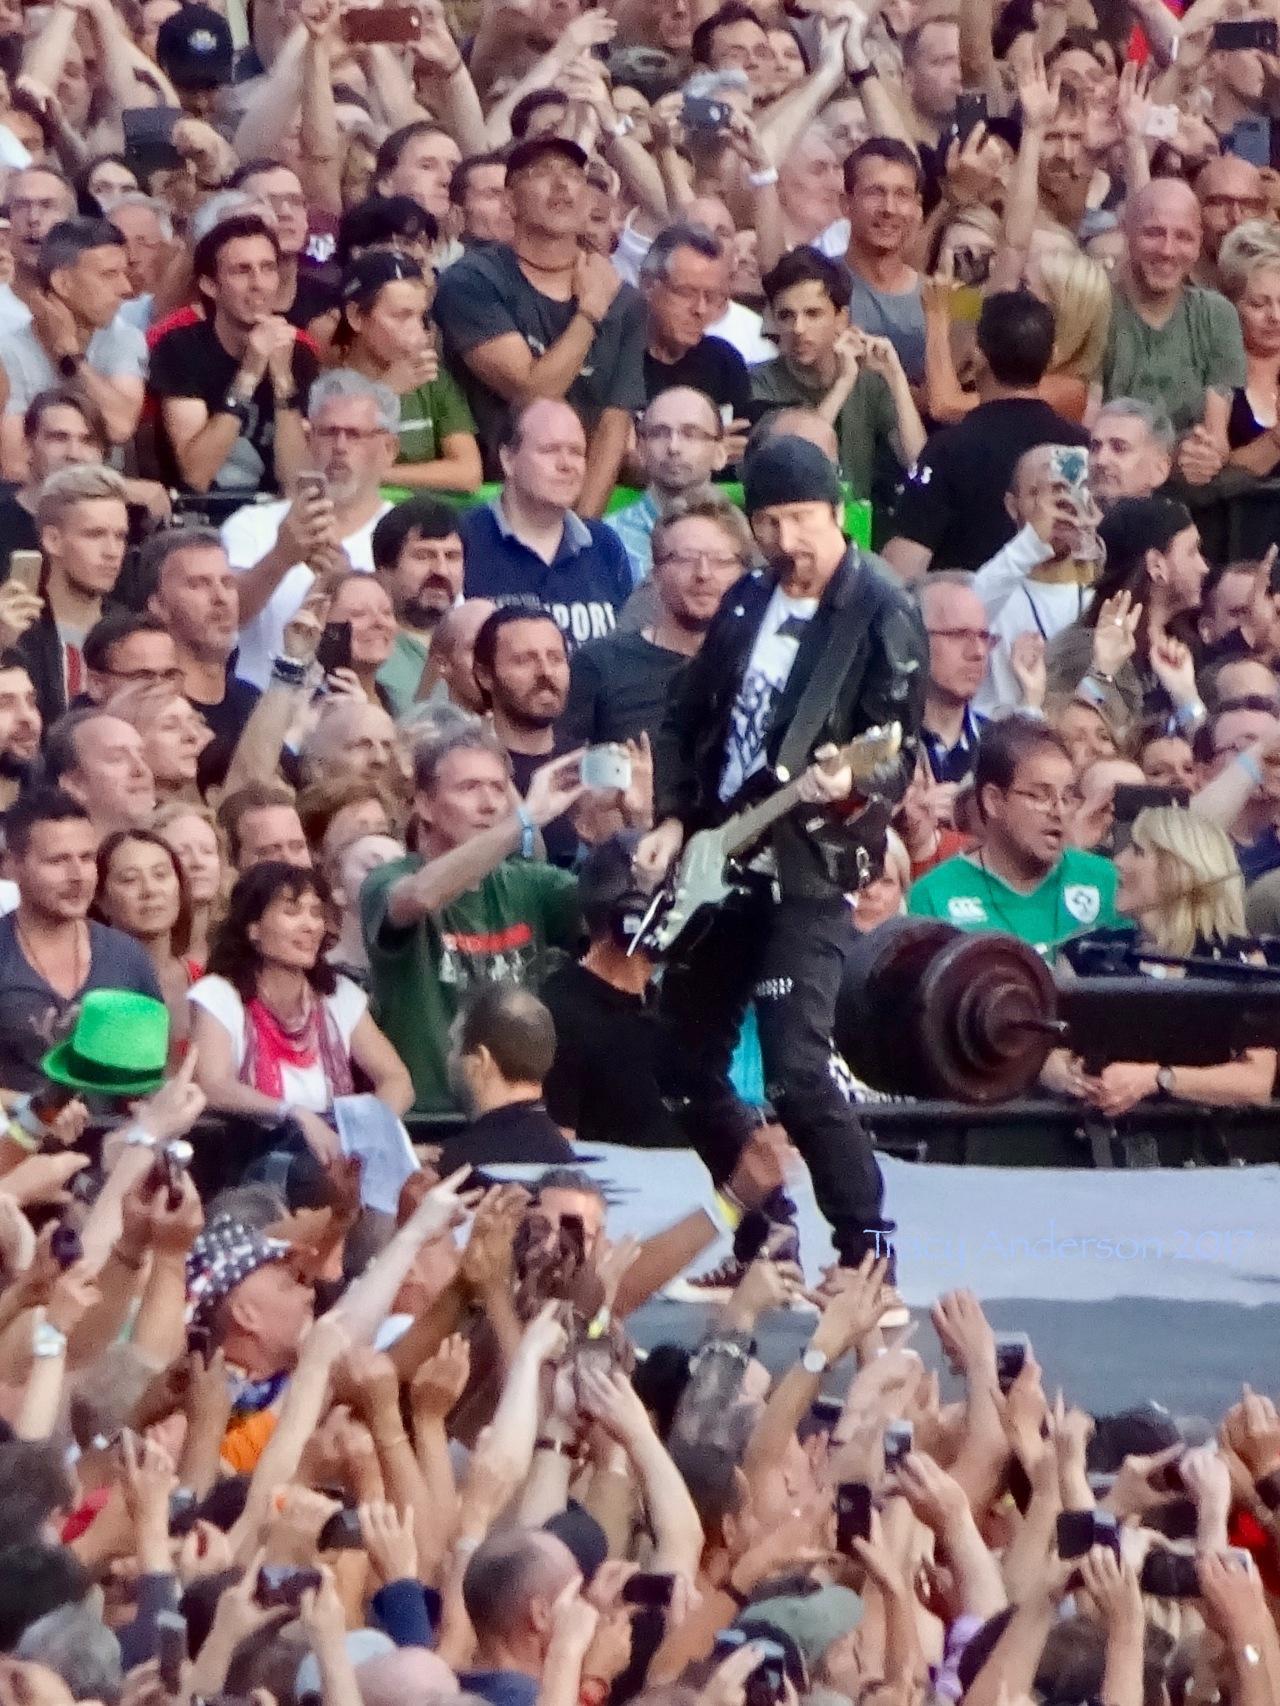 The Edge Sunday Bloody Sunday U2 Brussels August 1 2017